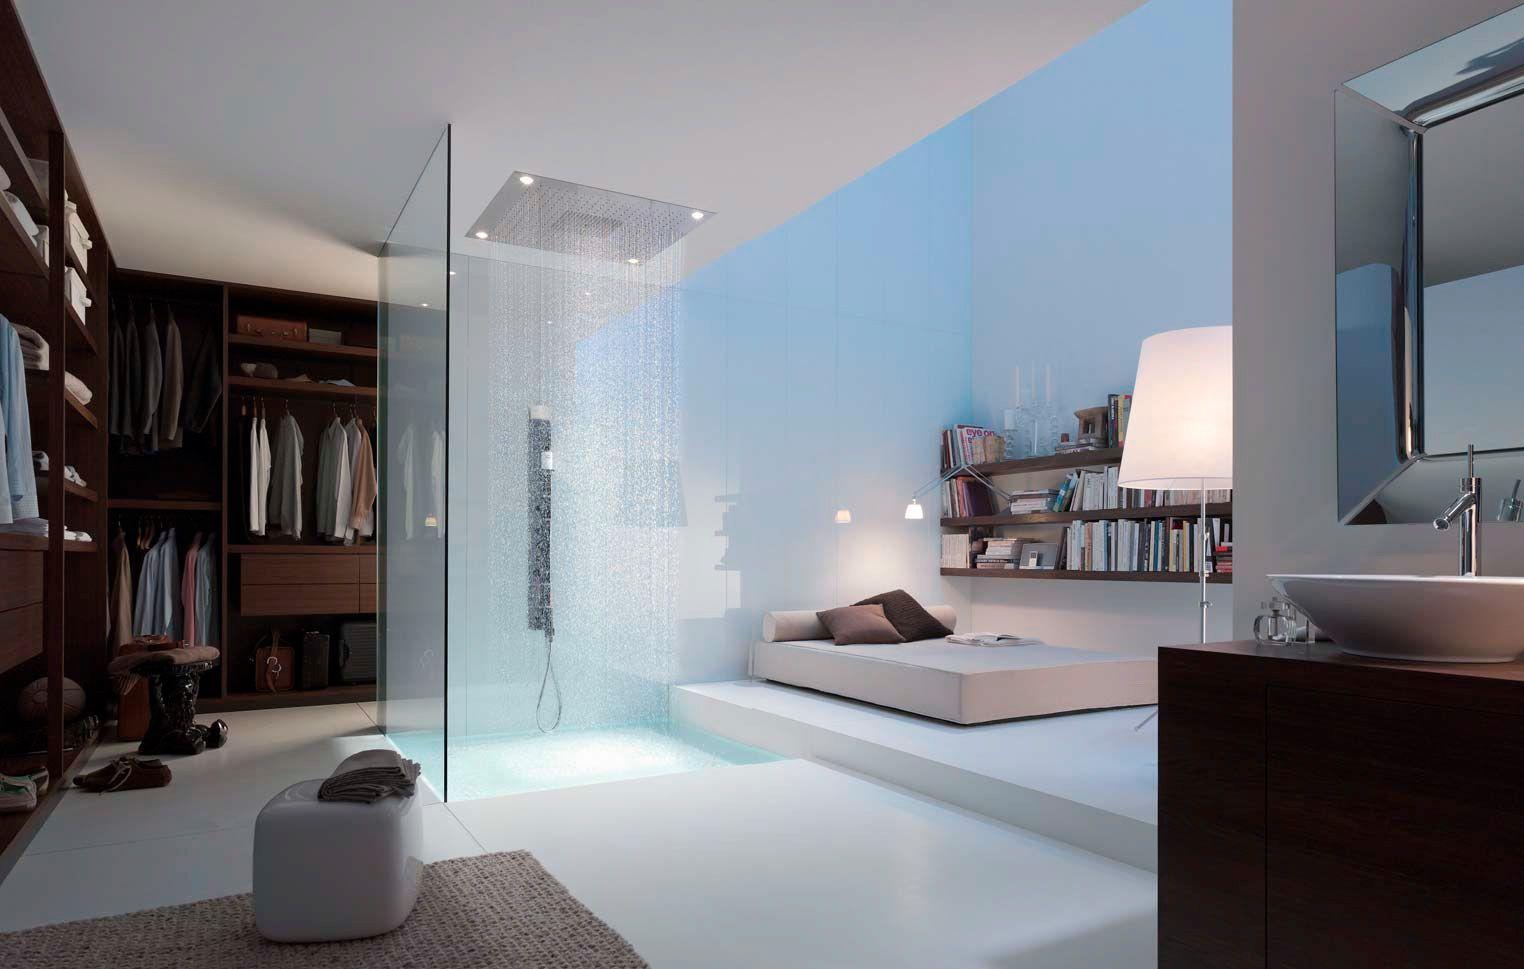 Una ducha espectacular